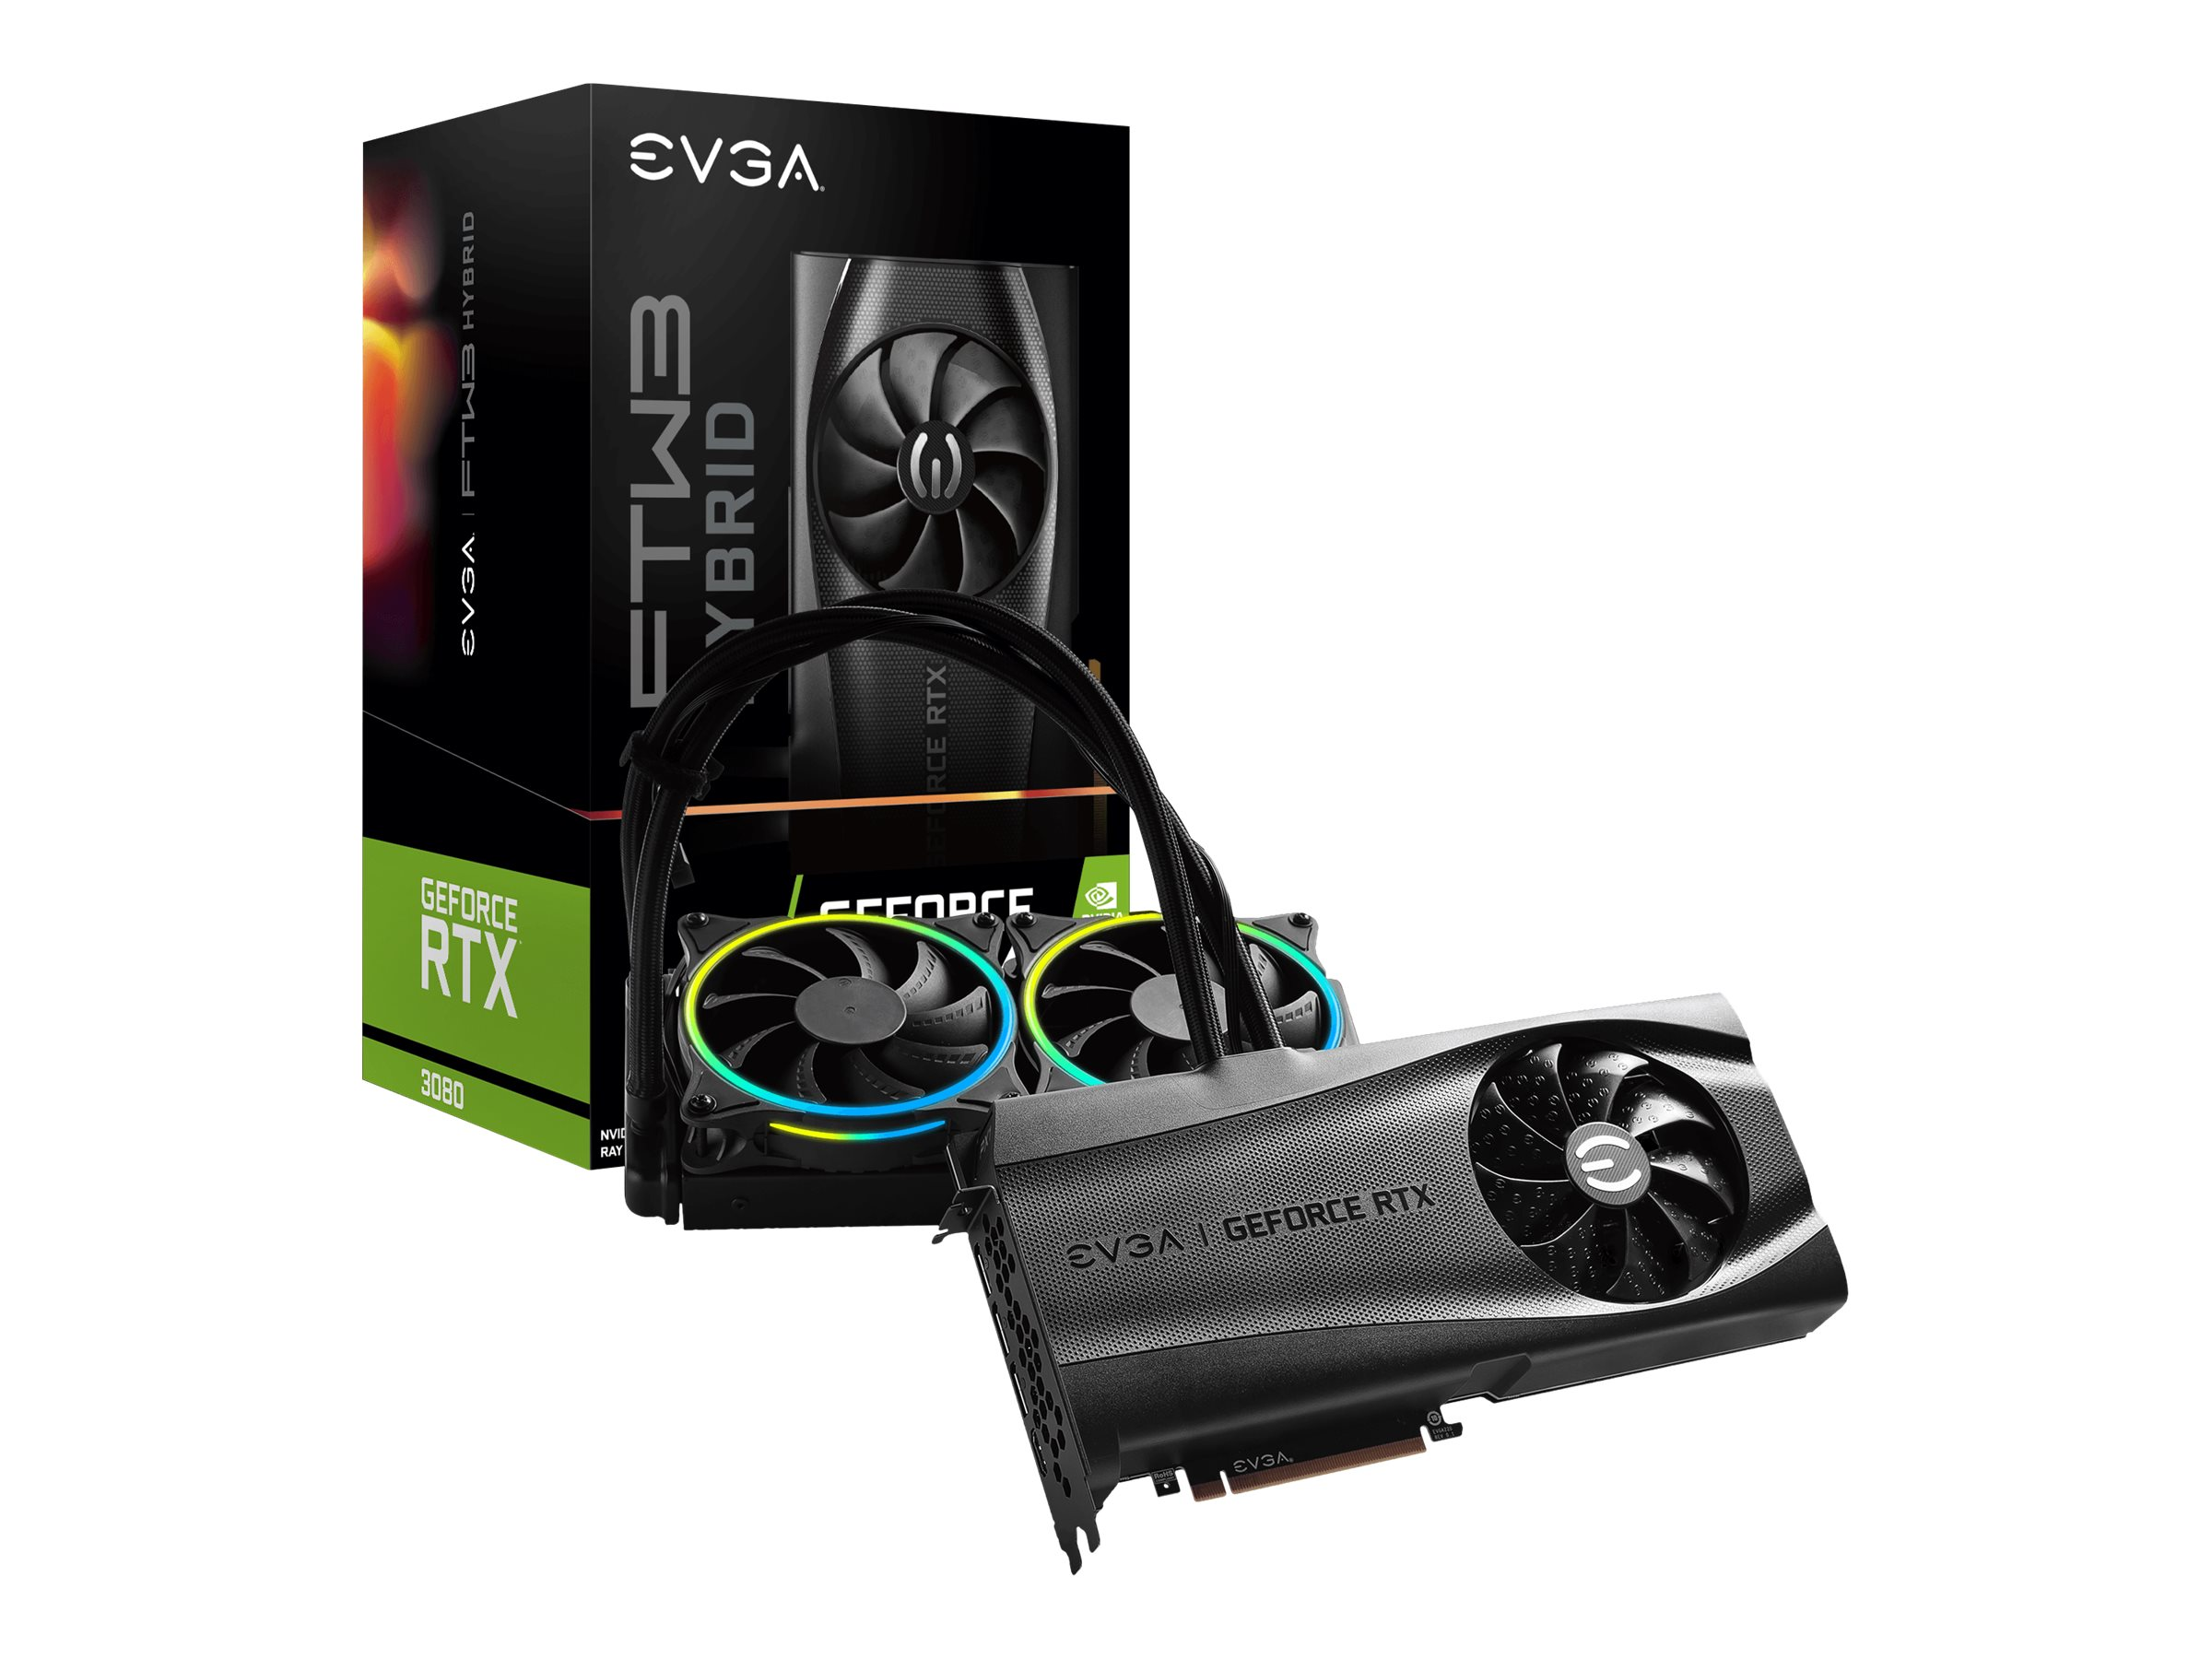 Vorschau: EVGA GeForce RTX 3080 FTW3 ULTRA HYBRID GAMING